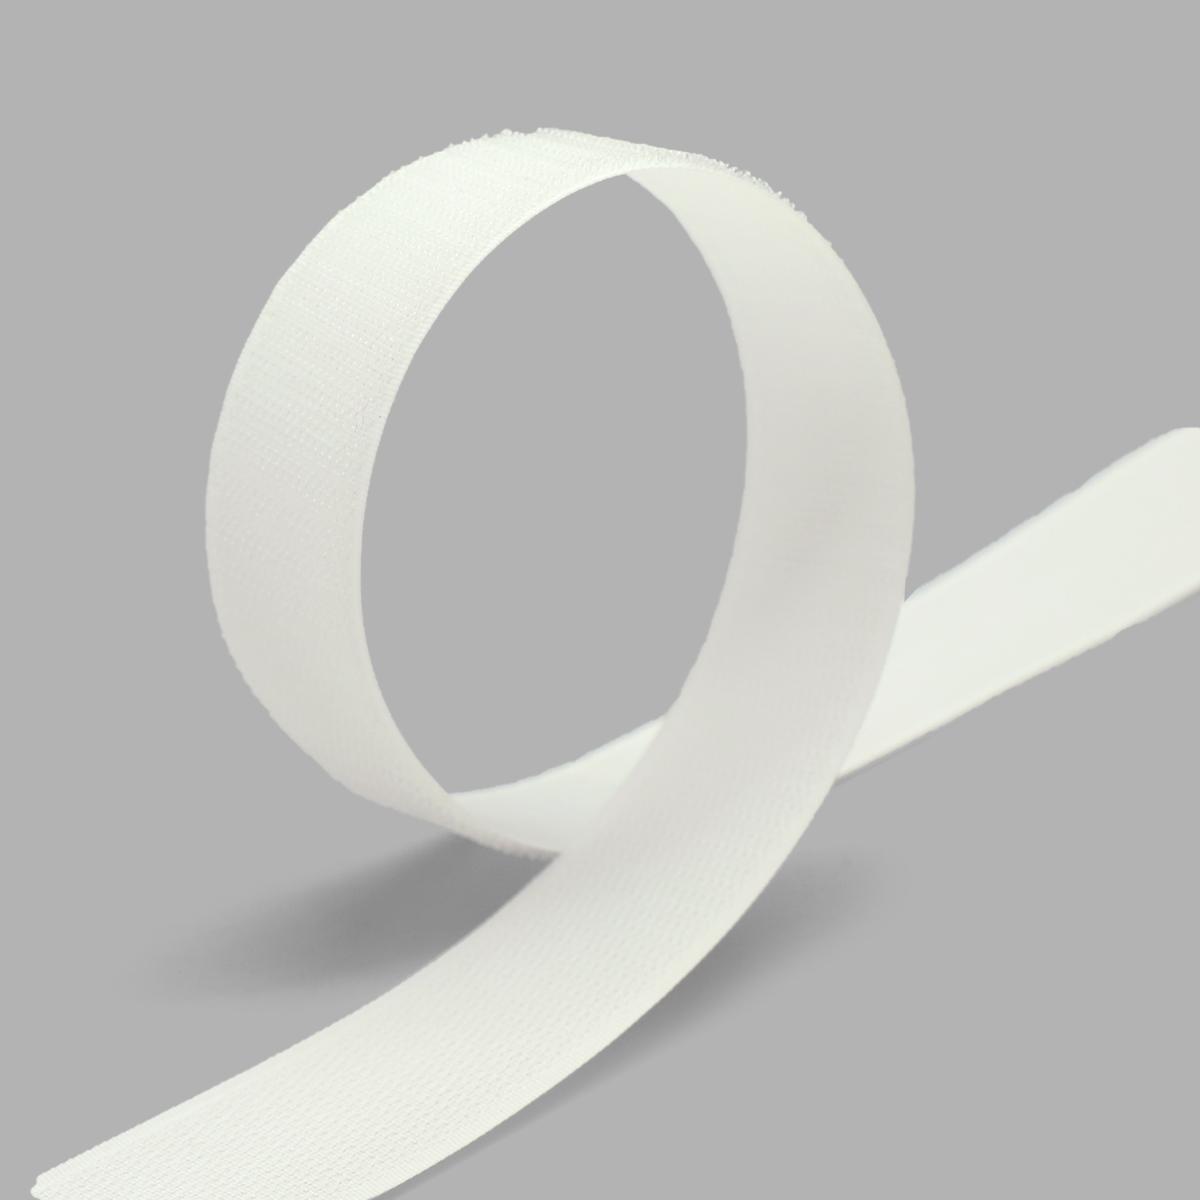 20203 Лента контактная 30мм. 25 м 'крючок' (бел.) фото